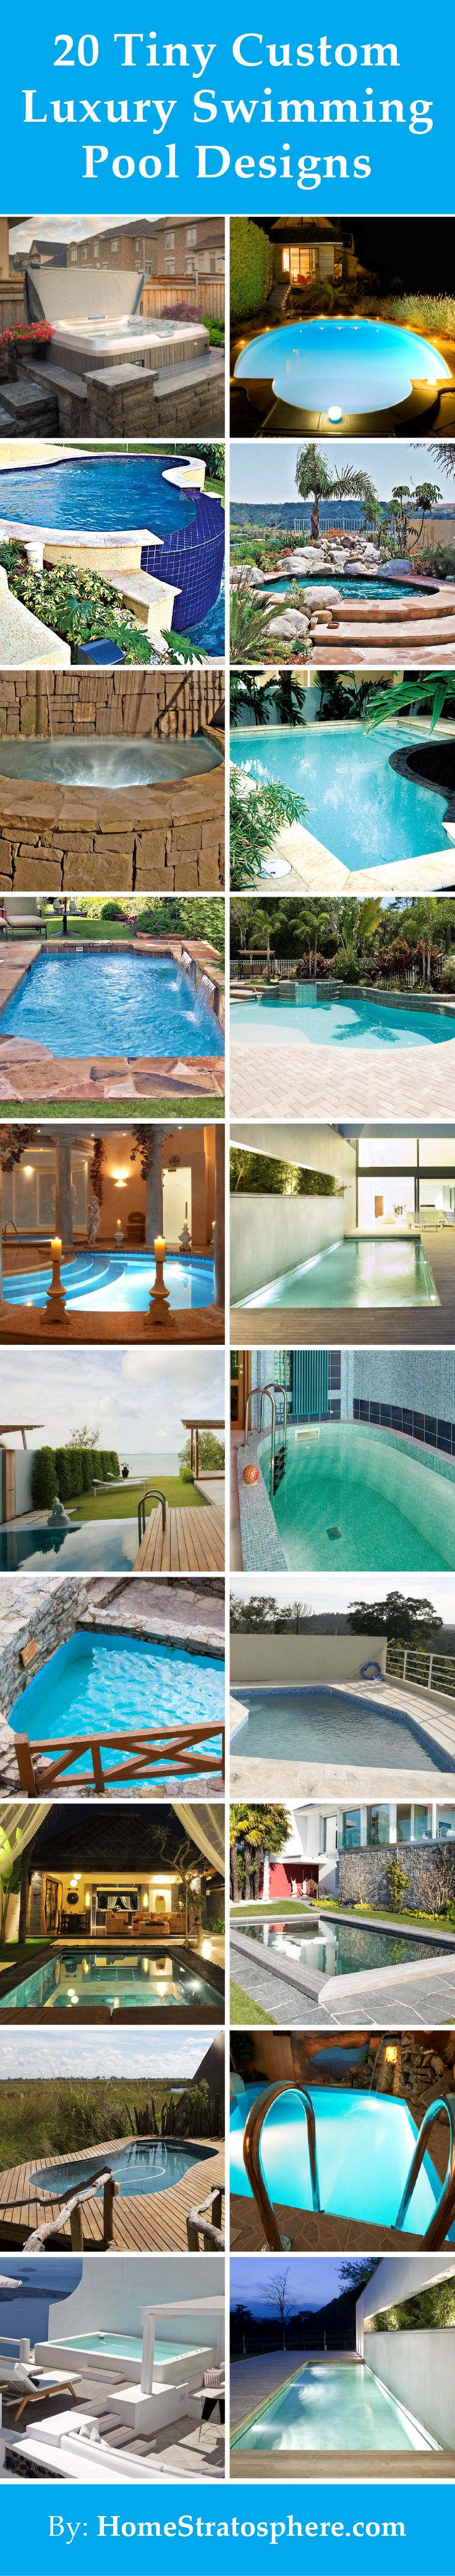 20 Tiny Custom Luxury Swimming Pool Designs (Photos)